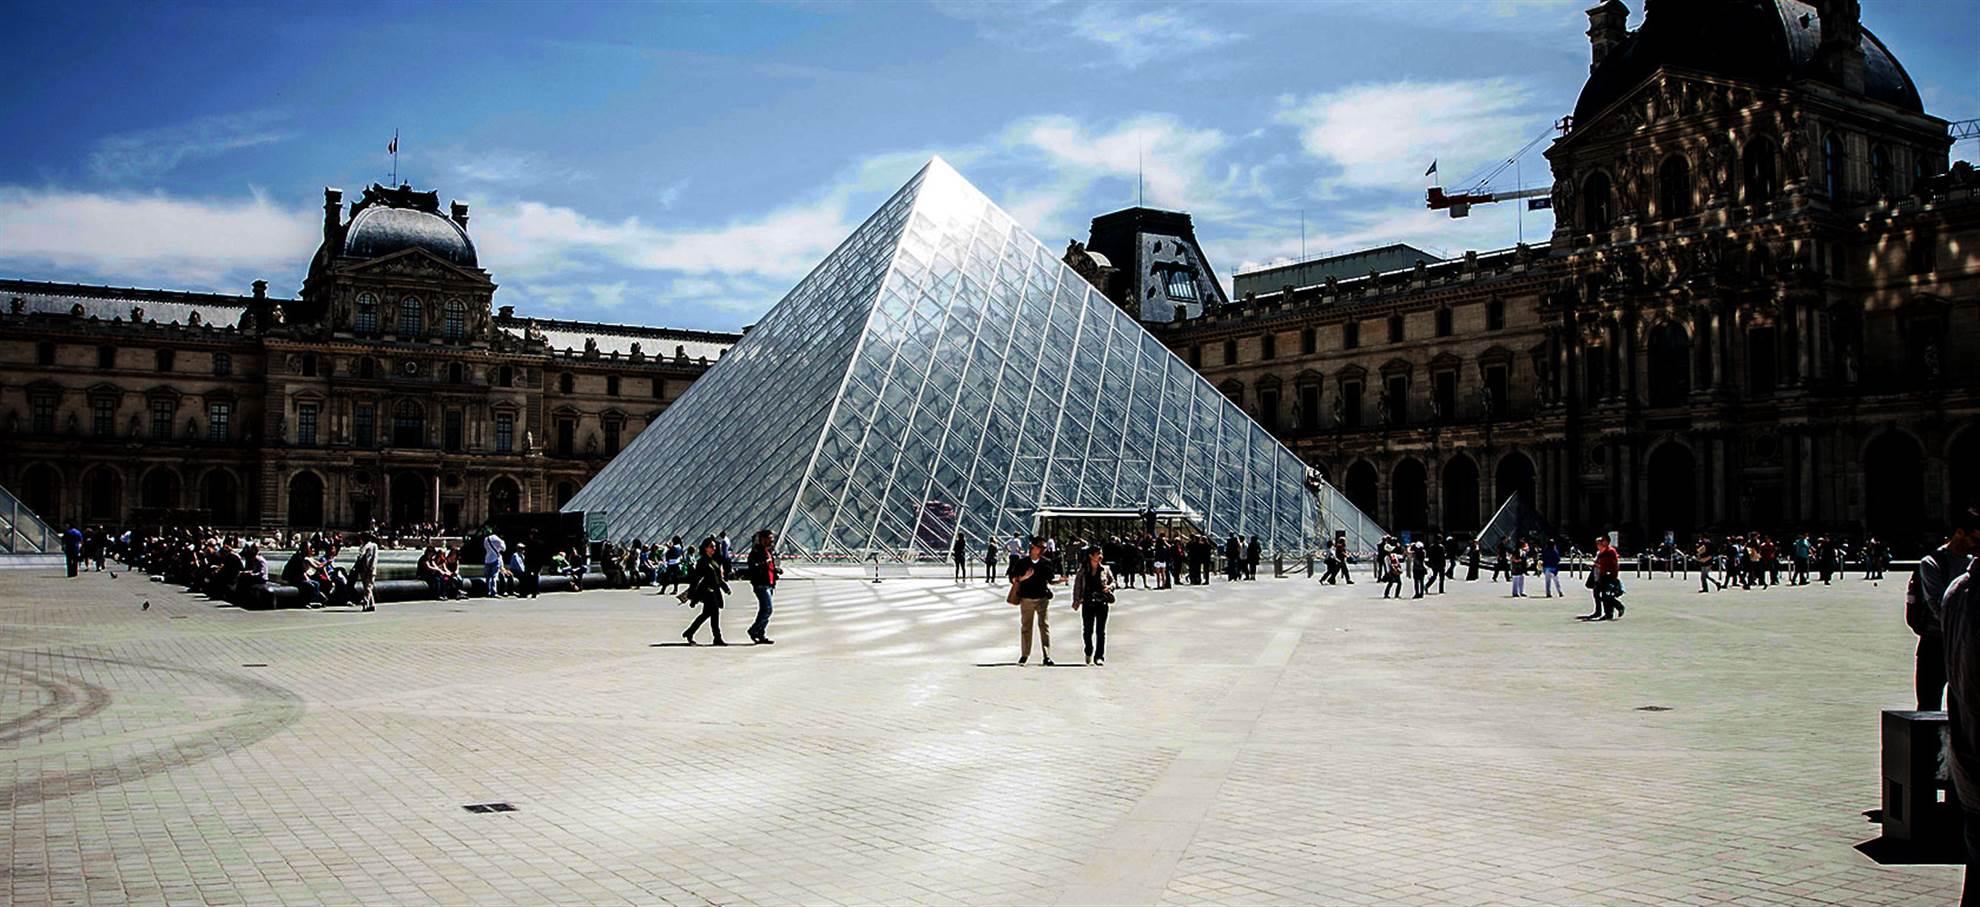 Audiogeführte Besichtigung des Louvre Museums